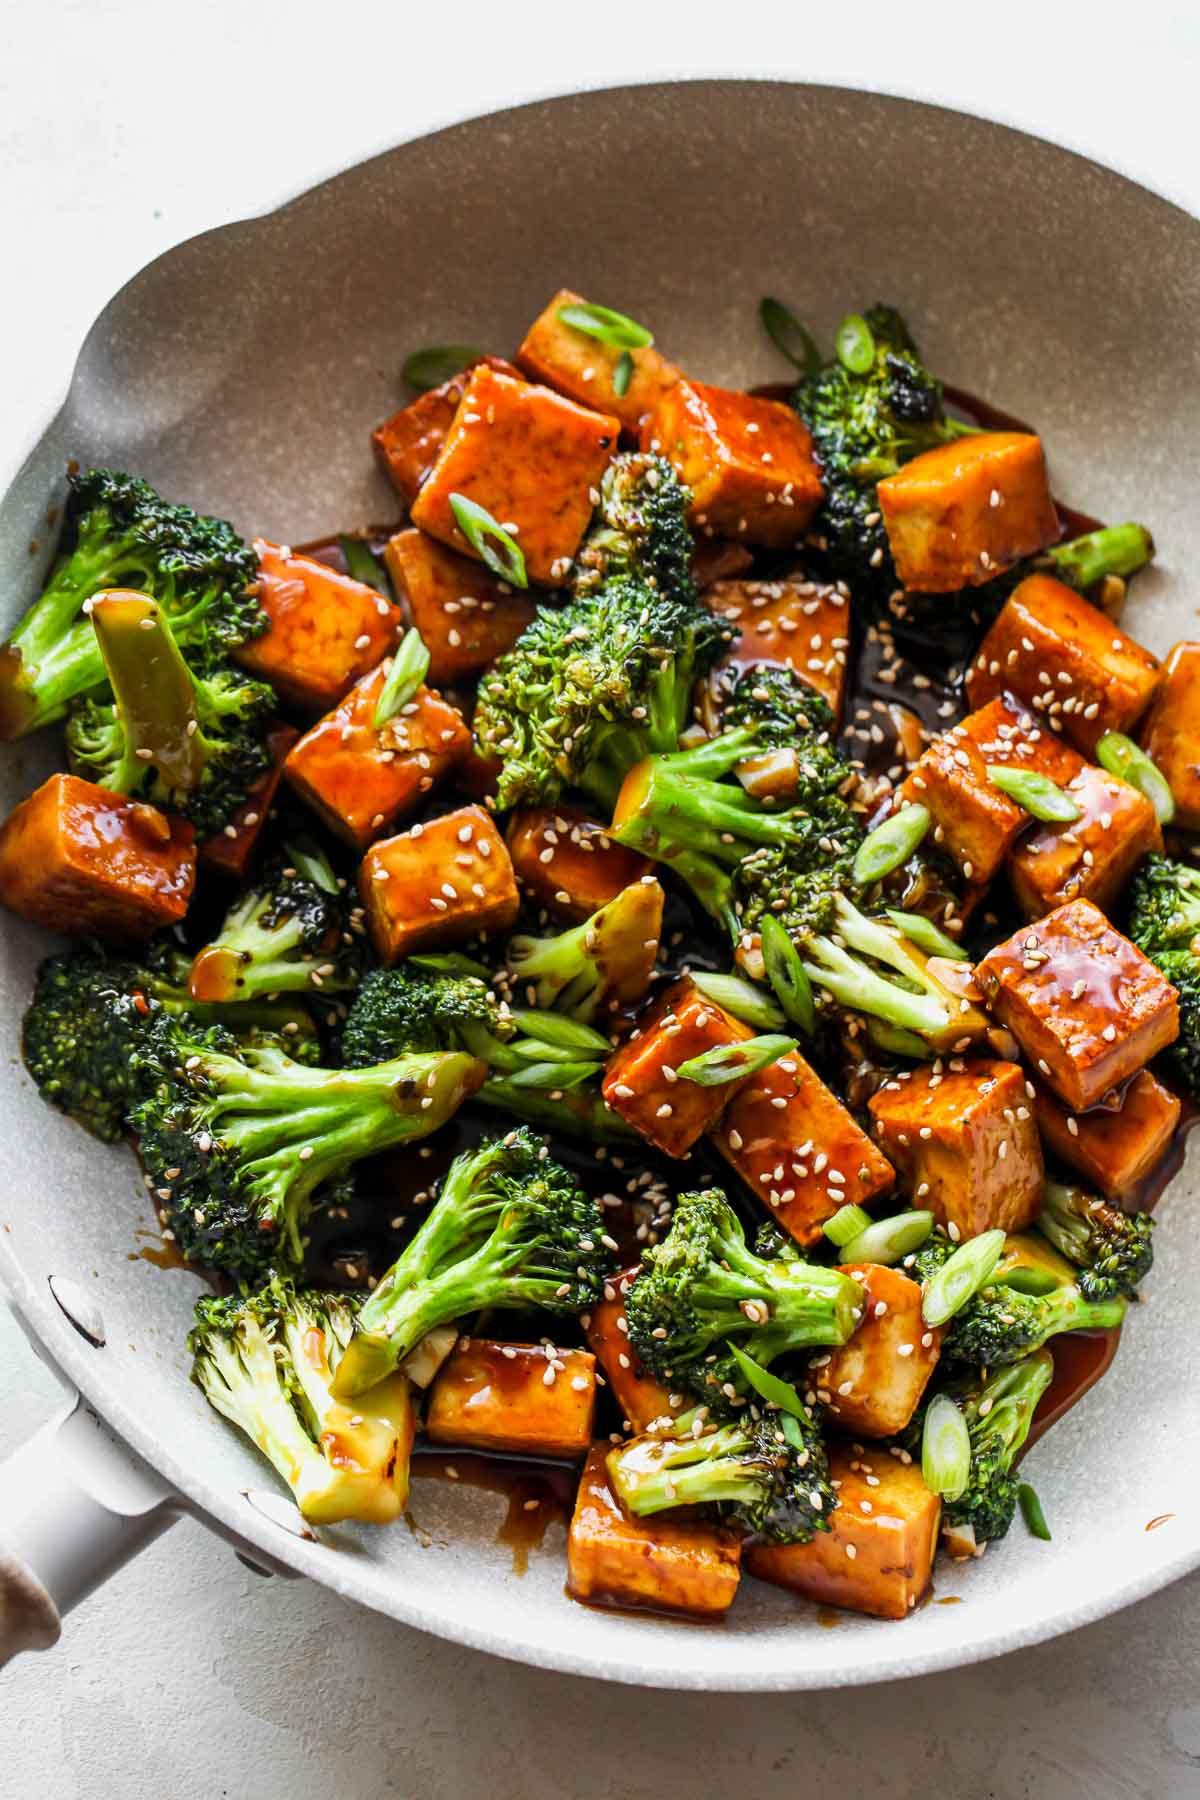 Teriyaki tofu and broccoli simmering in a white skillet